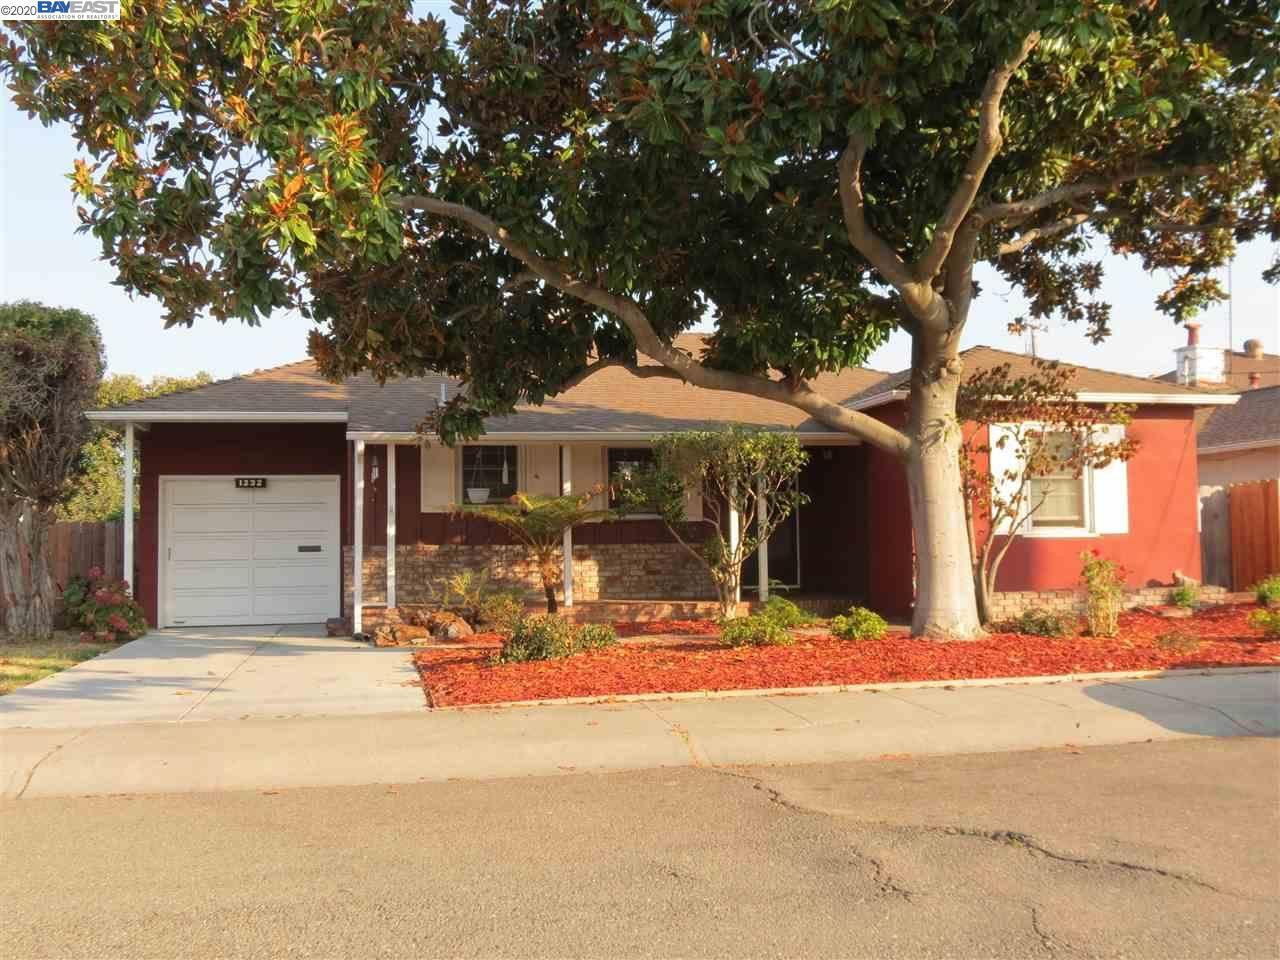 1232 Margery Avenue, San Leandro, CA 94578-3535 - MLS#: 40920546